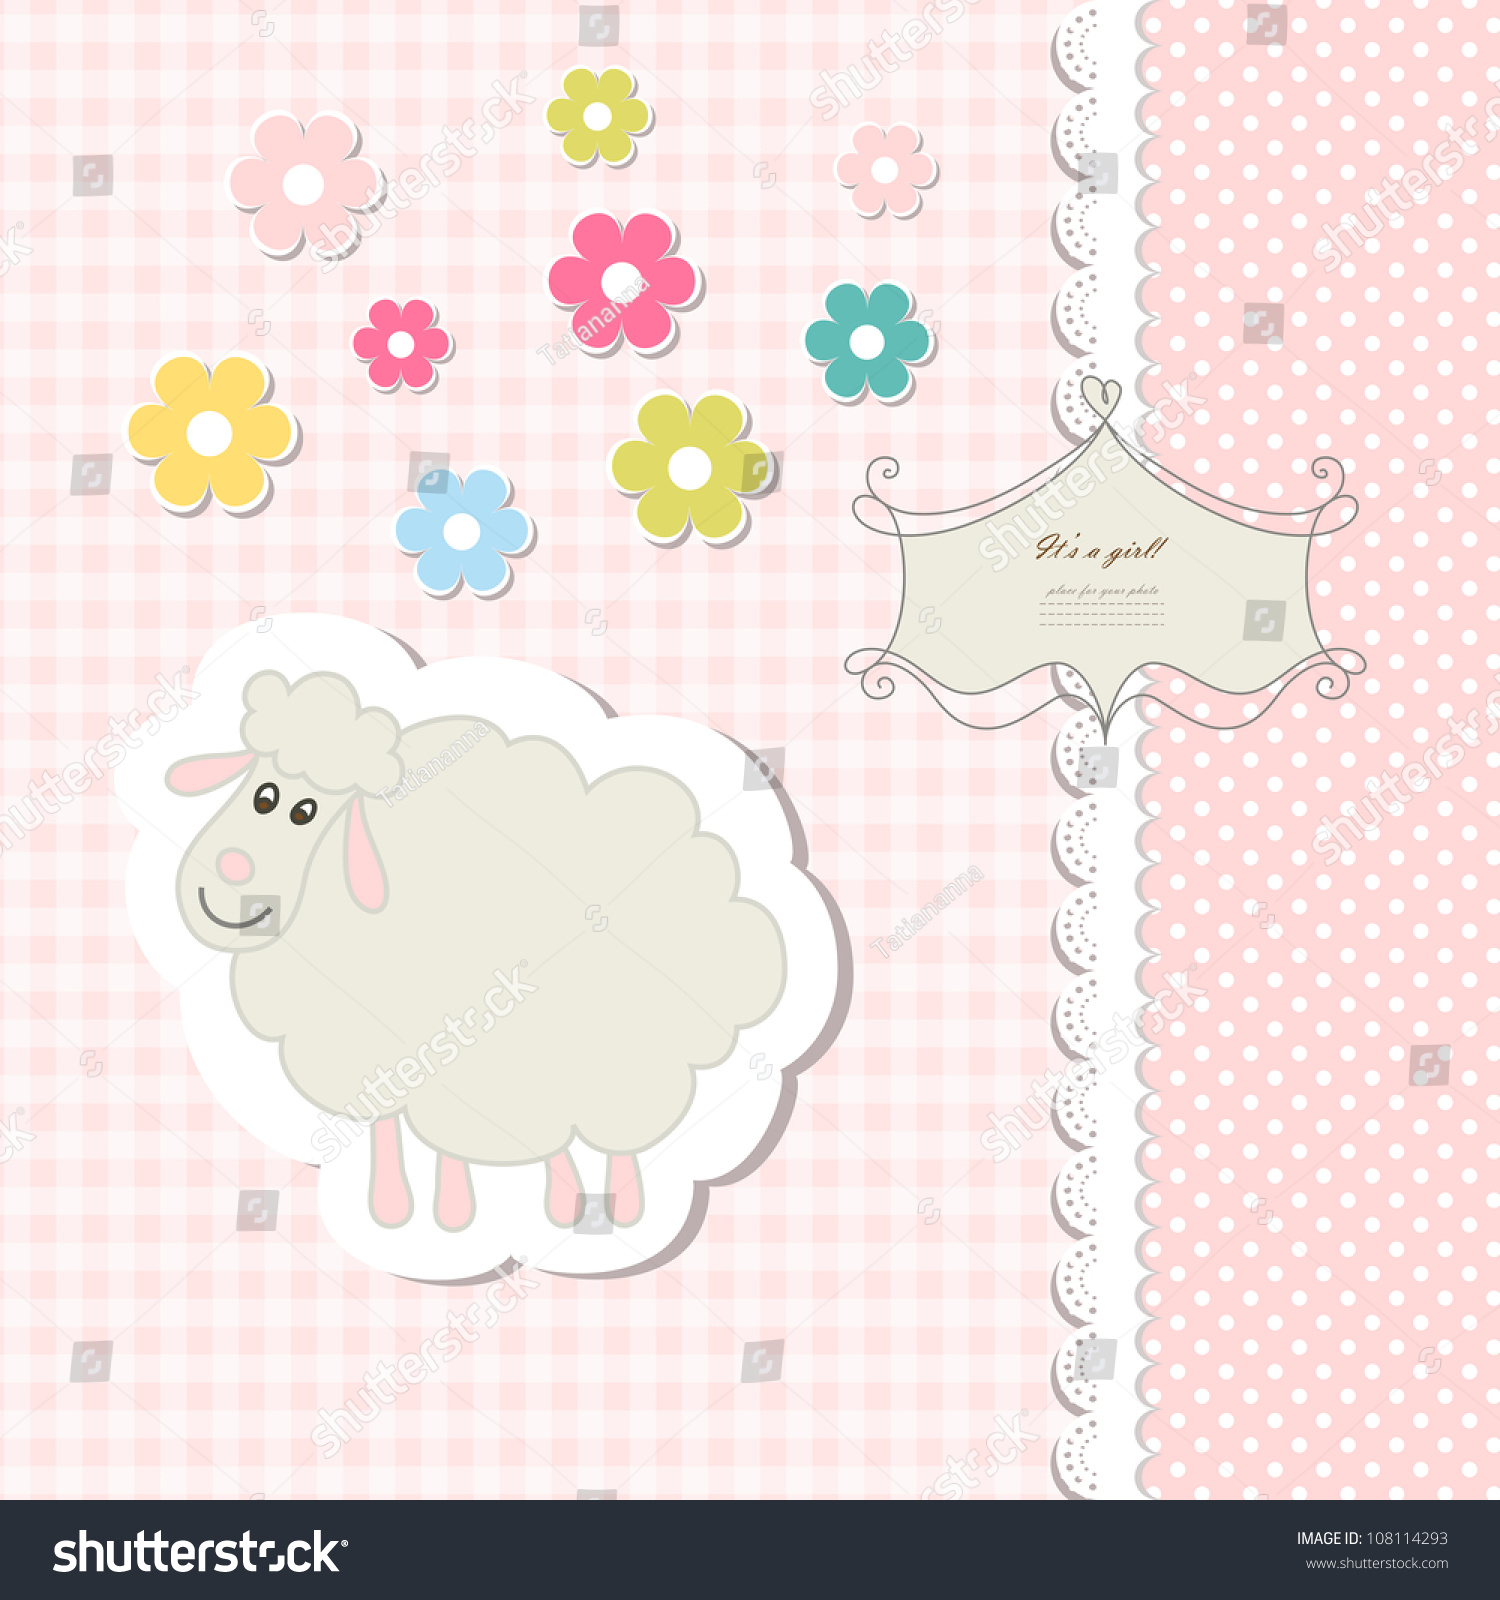 Retro Cute Art Sweet Kid Pink Stock Vector Shutterstock